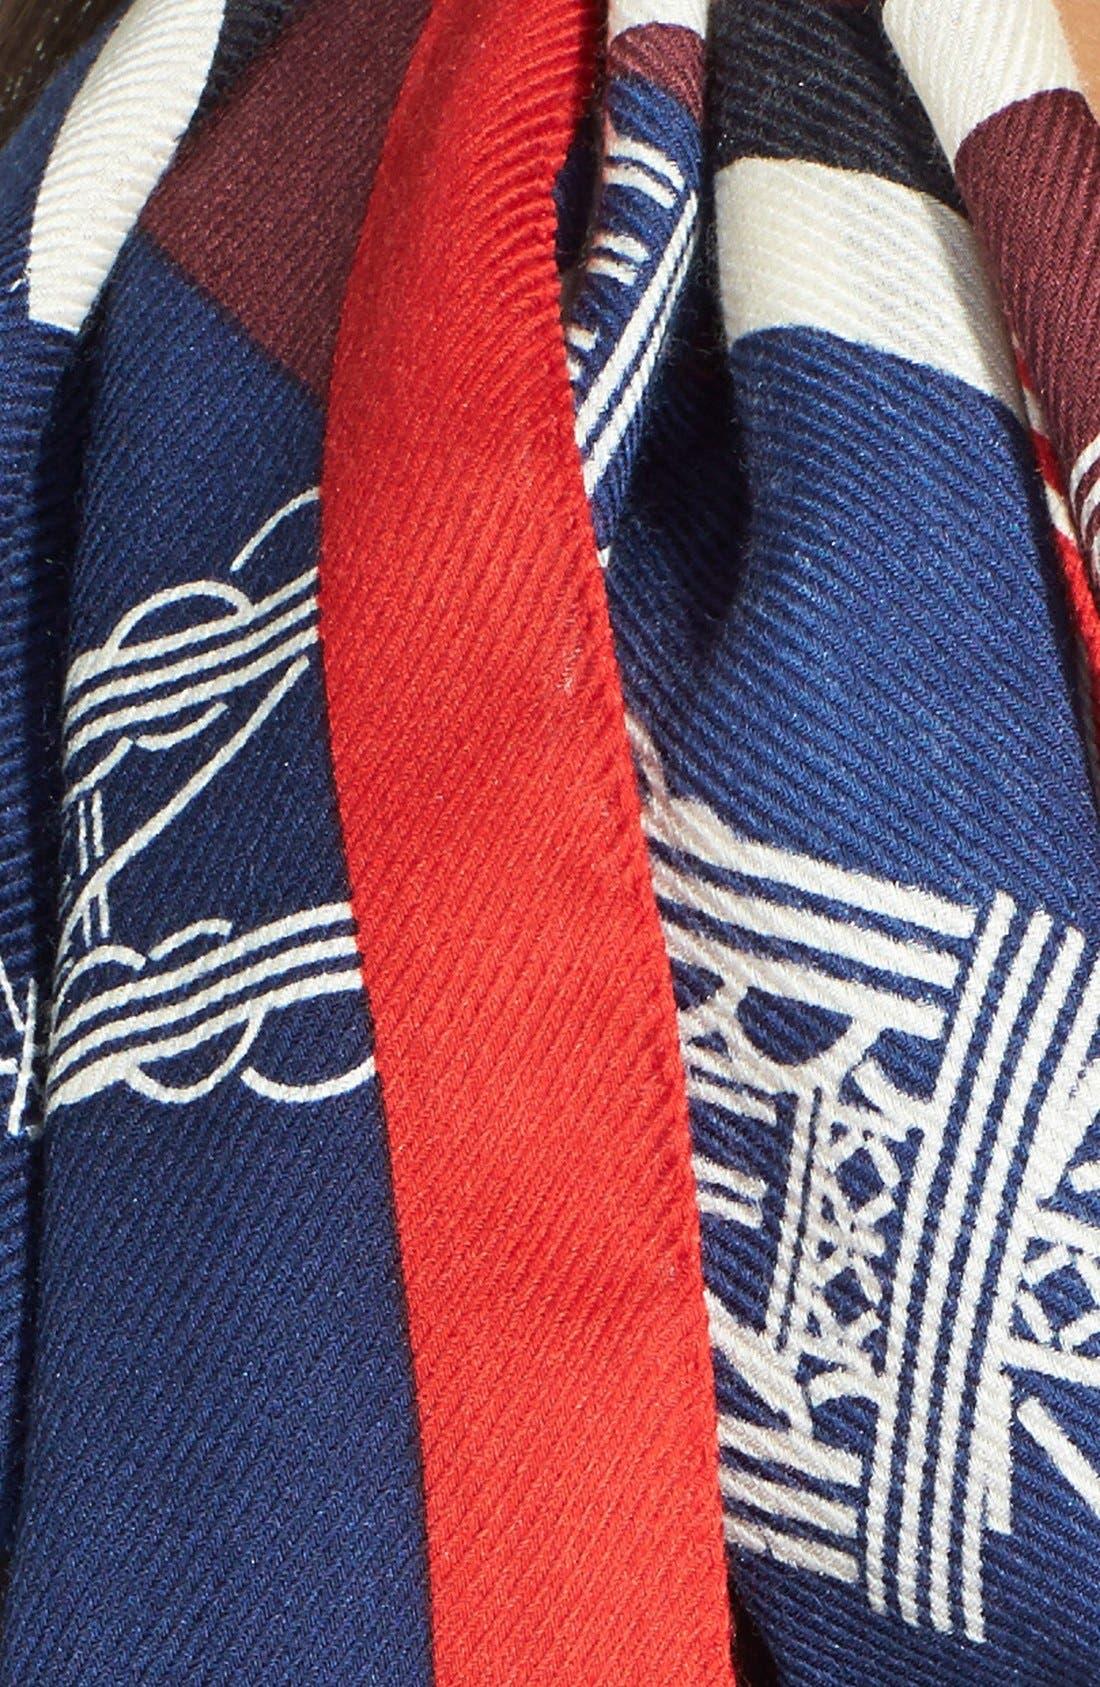 Alternate Image 3  - KENZO 'Tour Eiffel' Wool & Silk Scarf